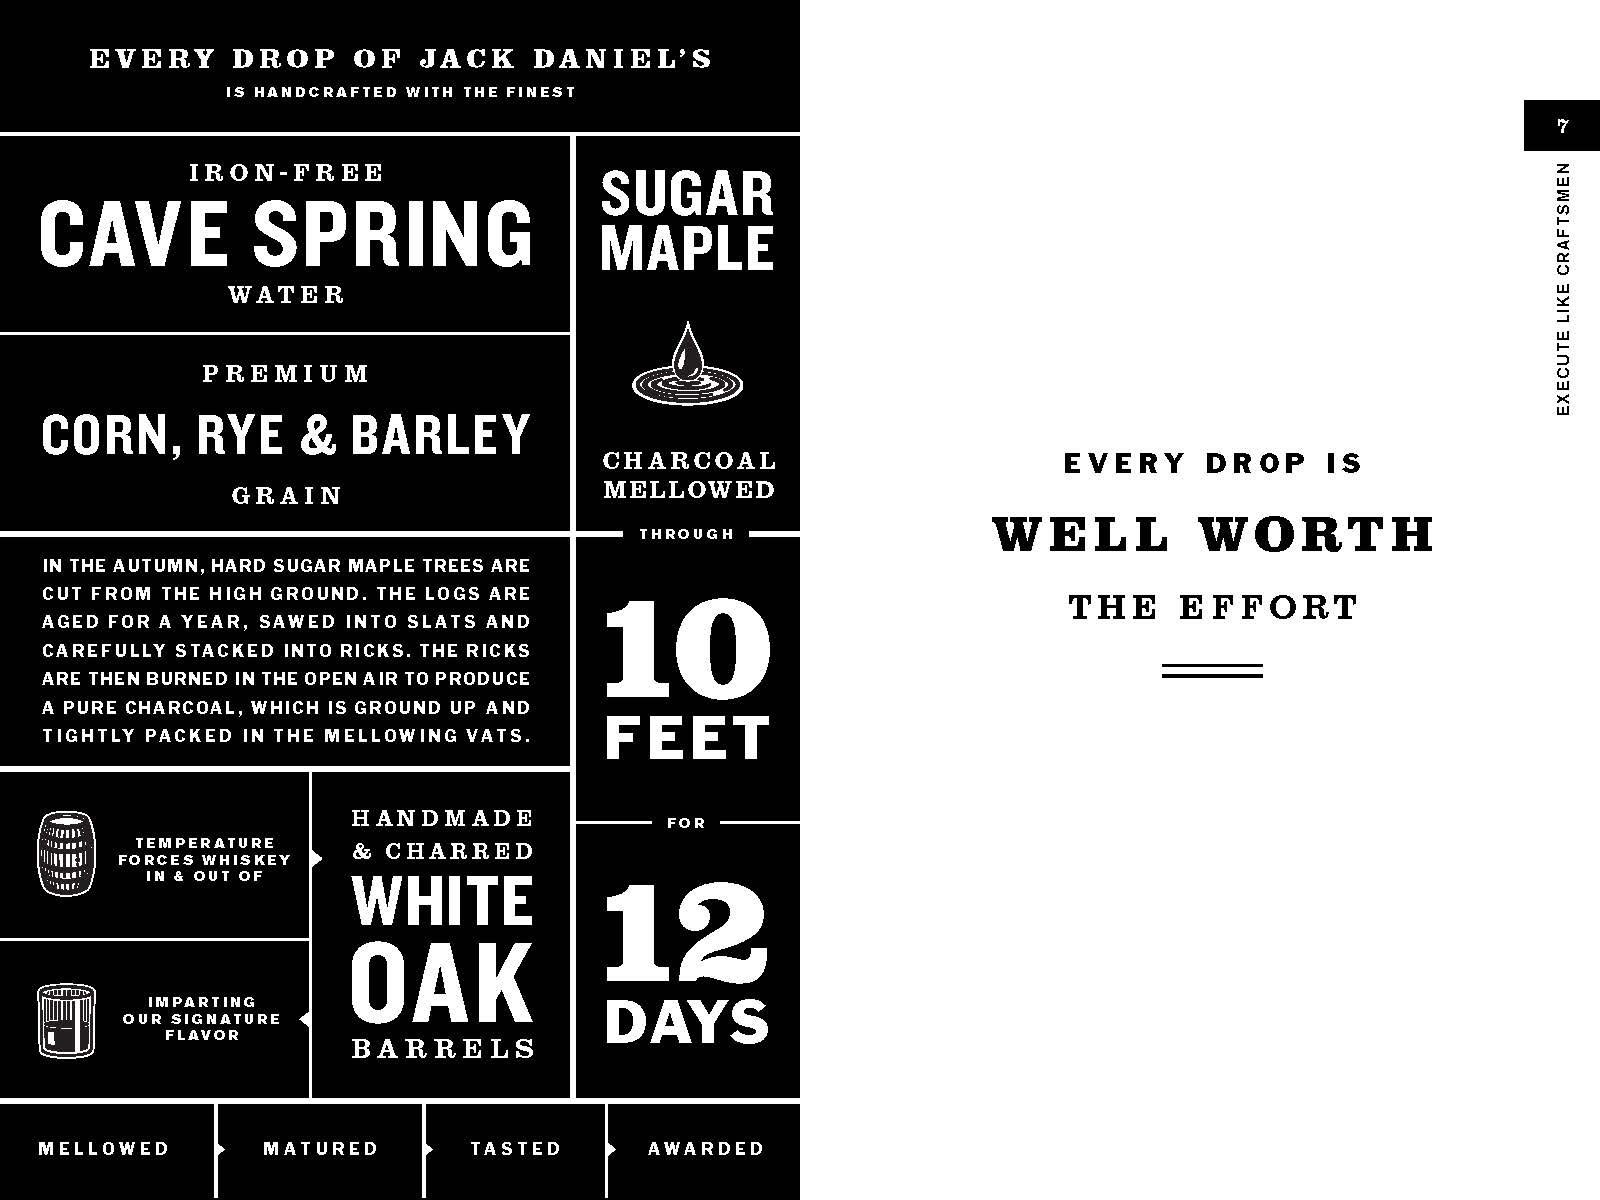 Jack Daniel's Guiding Principles 2012_Page_07.jpg